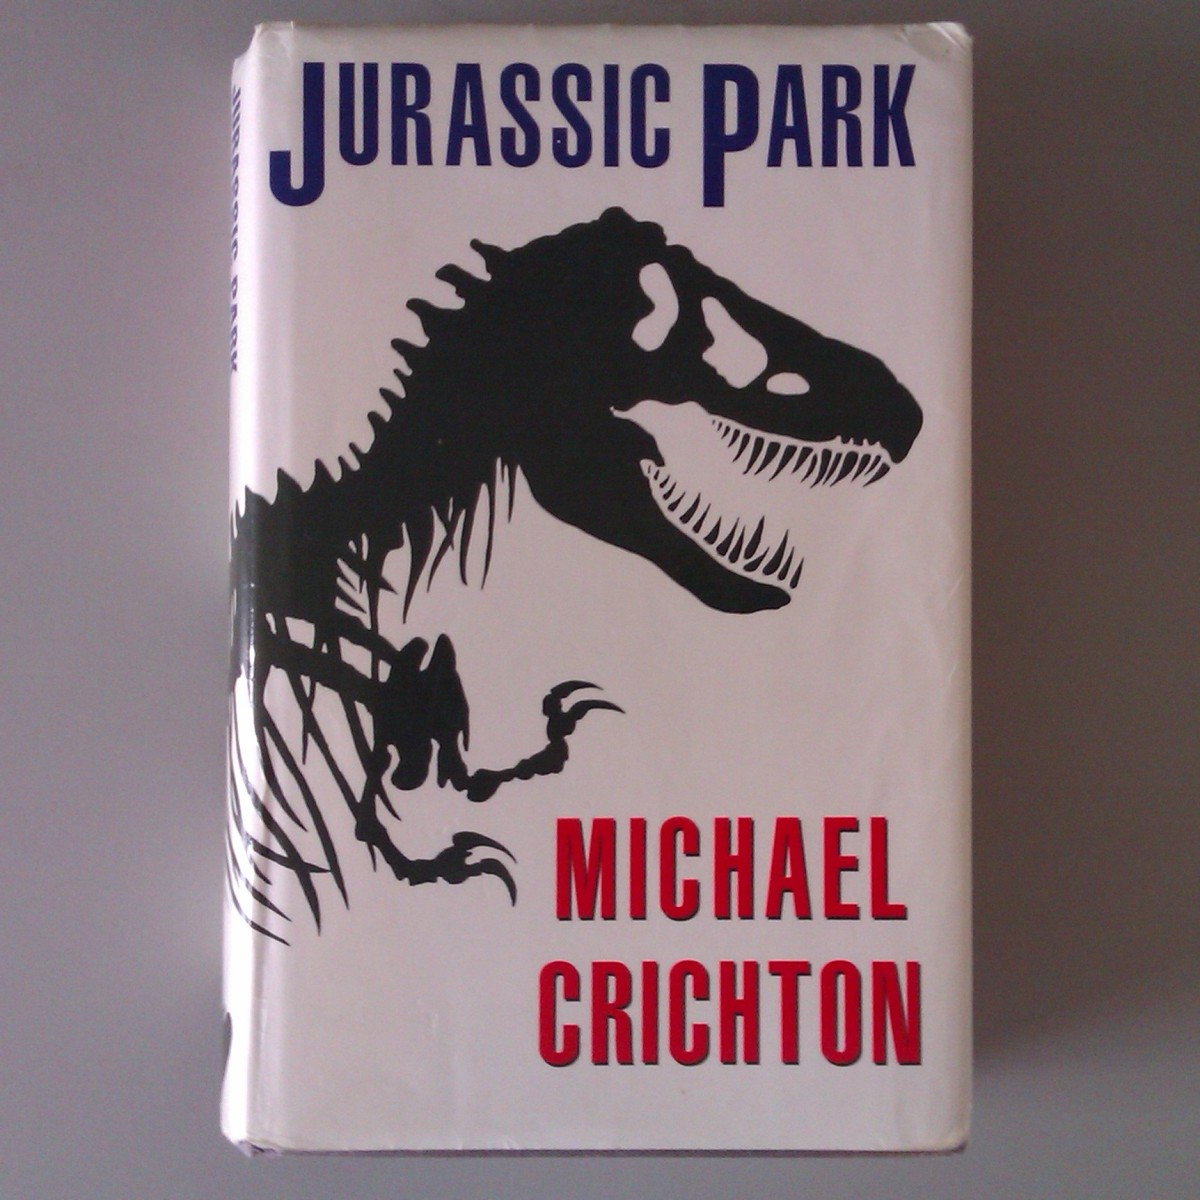 My Slightly Battered Copy of 'Jurassic Park'